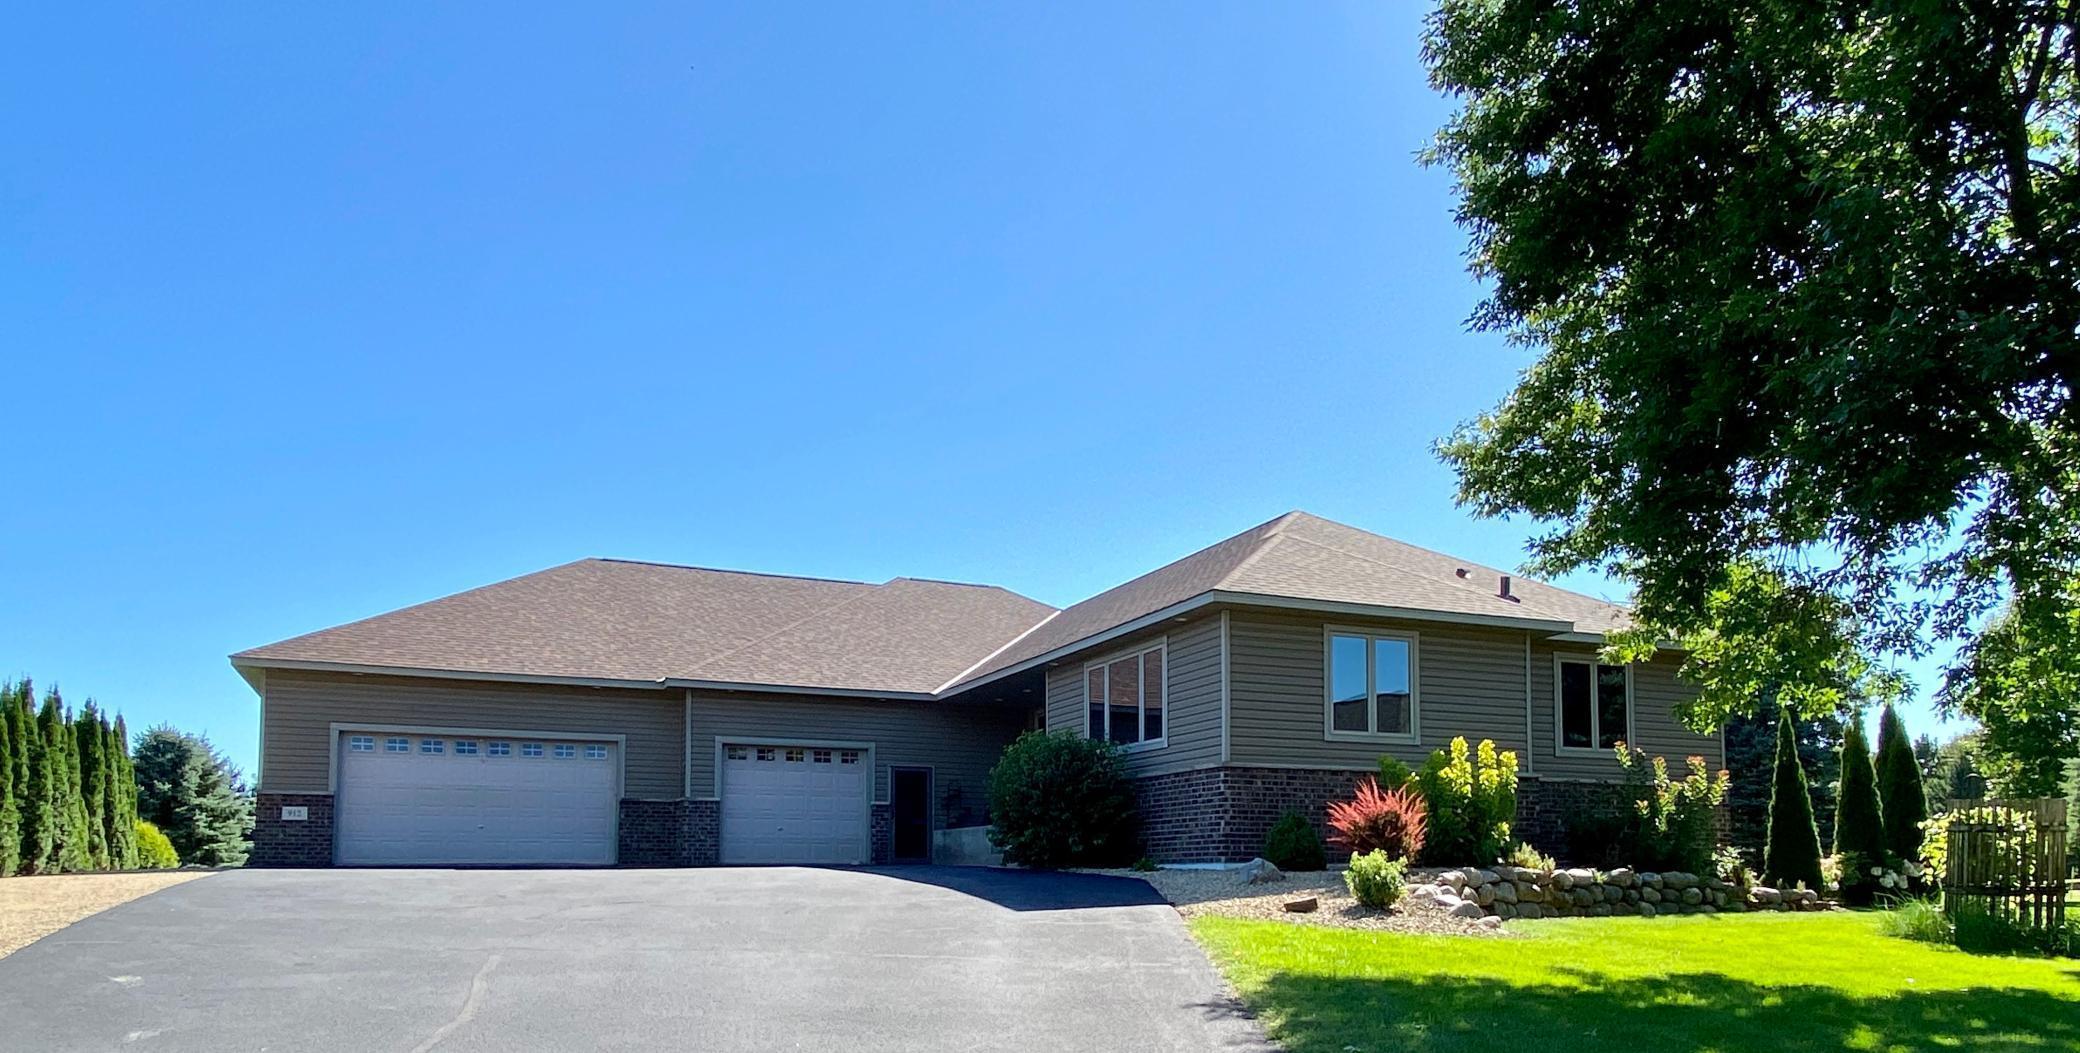 912 207th Avenue NE Property Photo - East Bethel, MN real estate listing